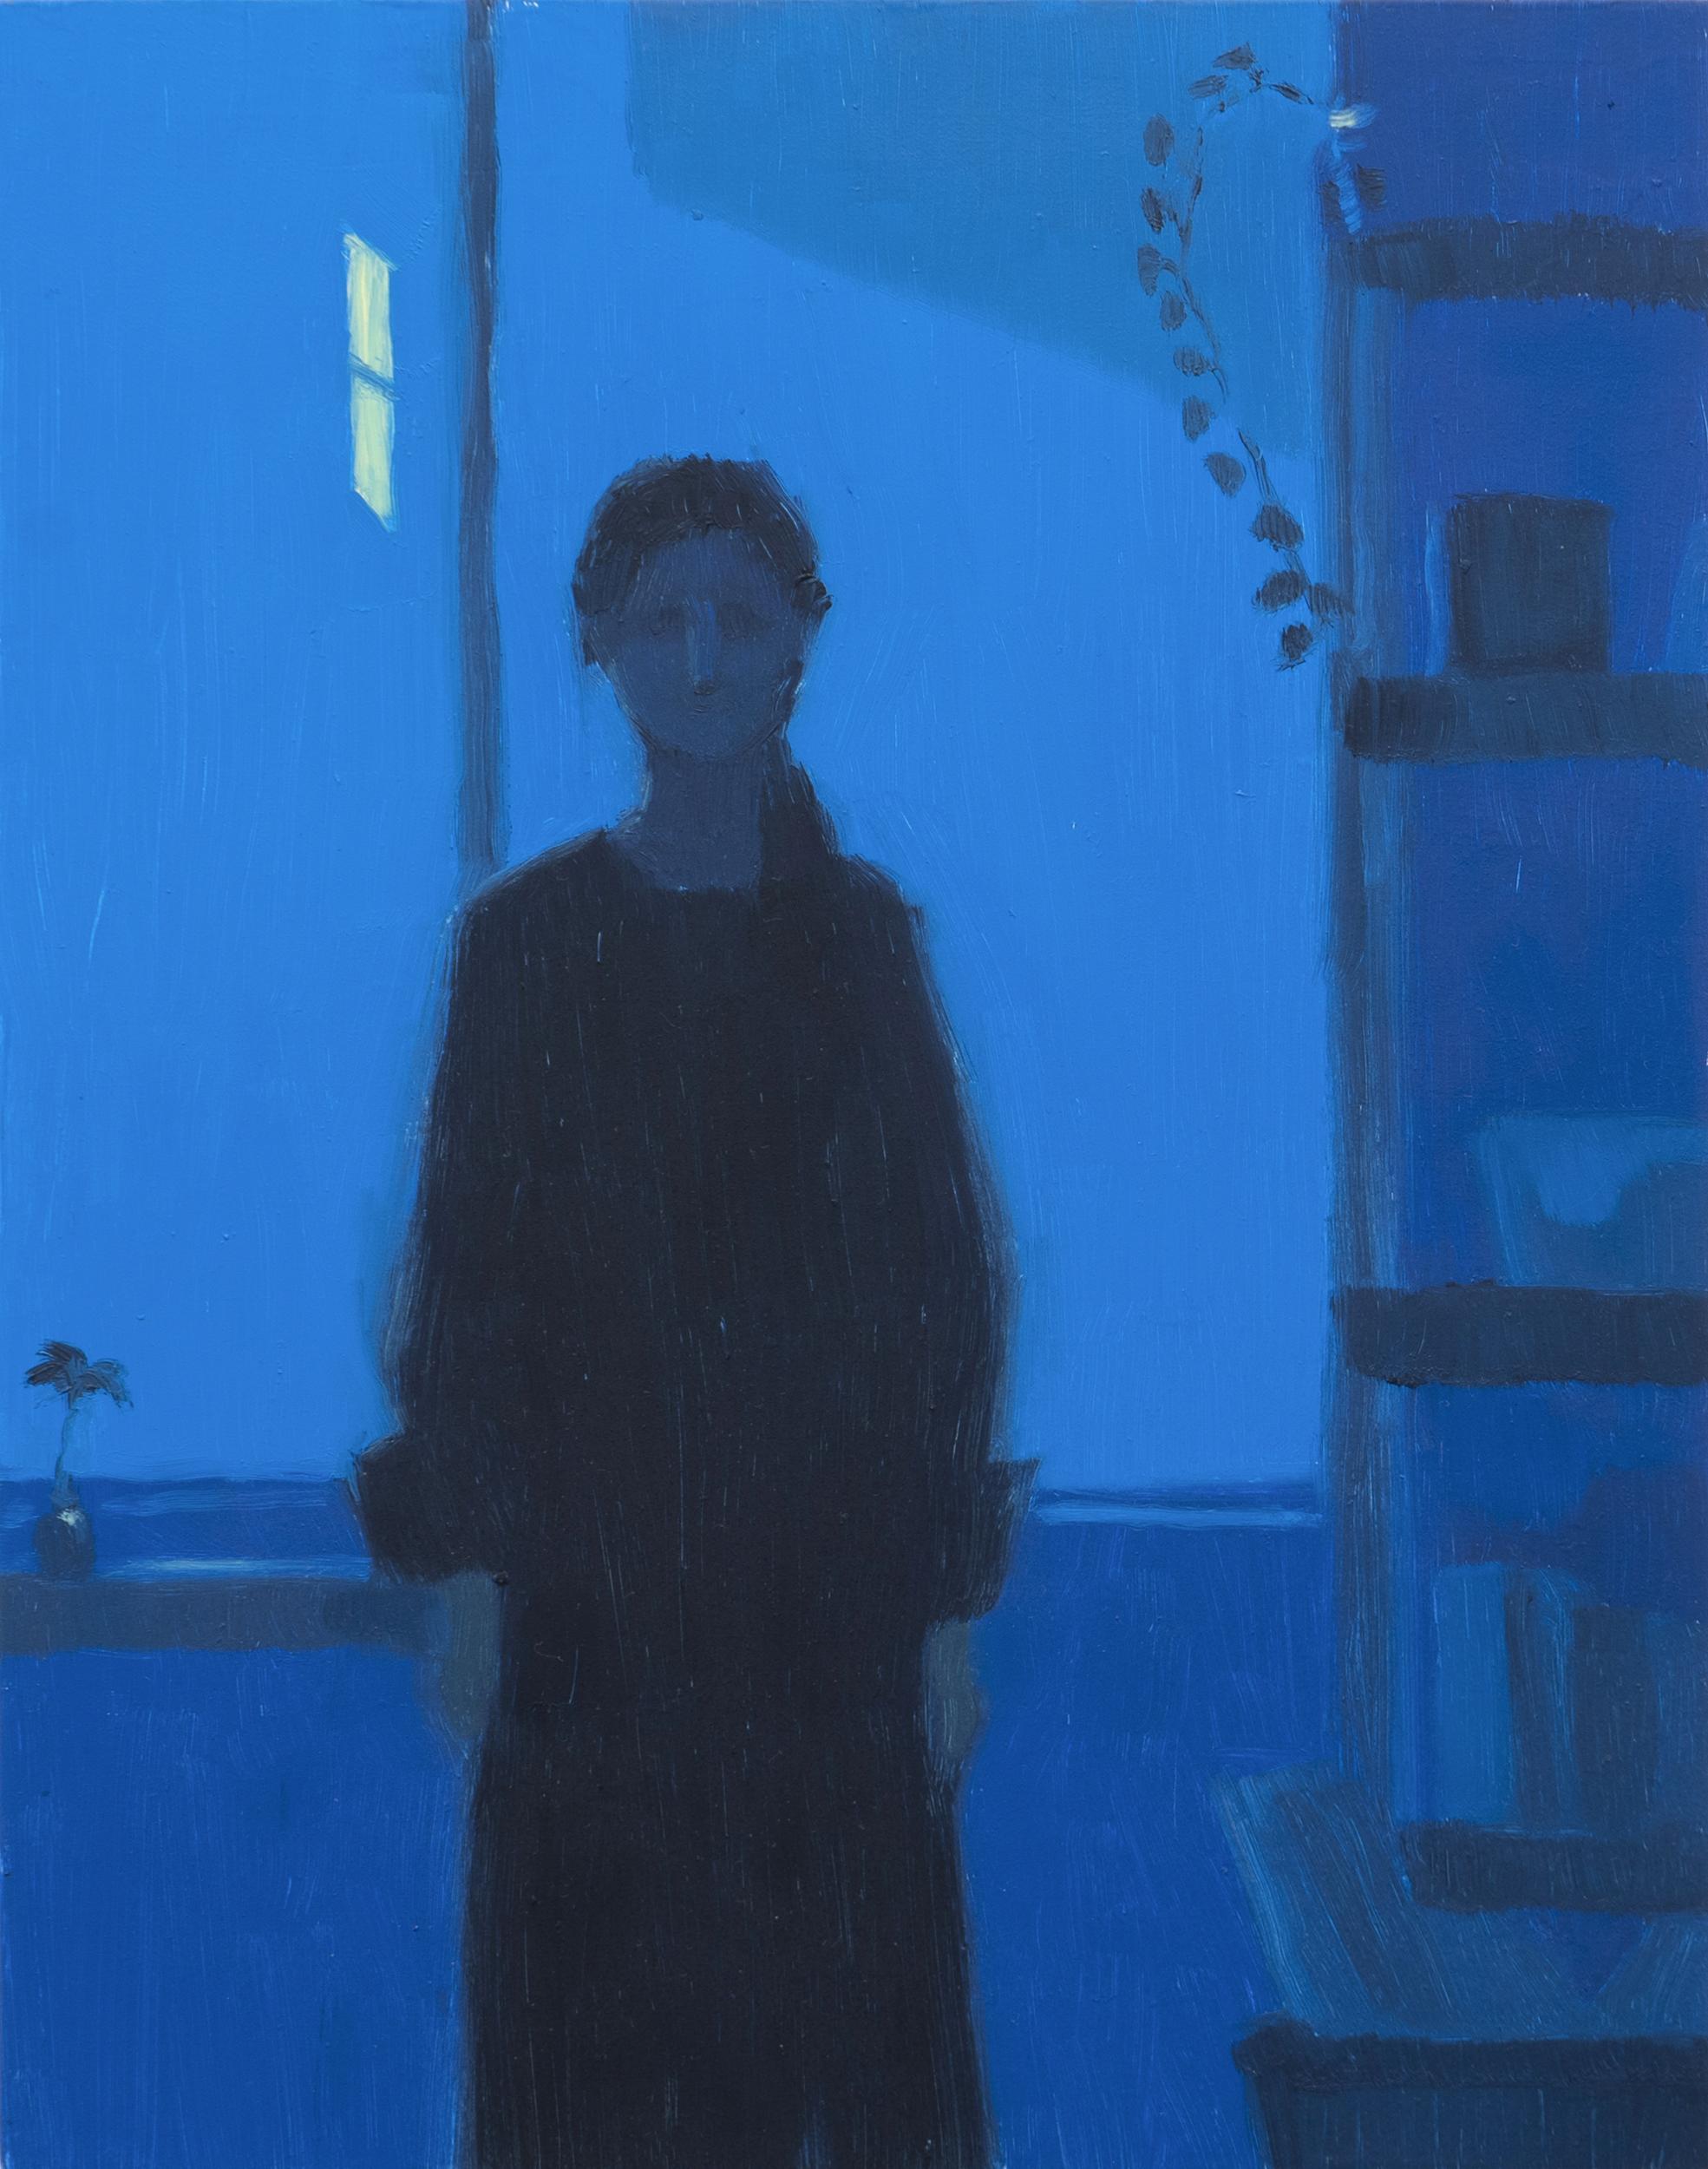 Yuri Yuan Blue Series: Figure, 2021 oil on board 14 x 11 in. (35.6 x 27.9 cm.)